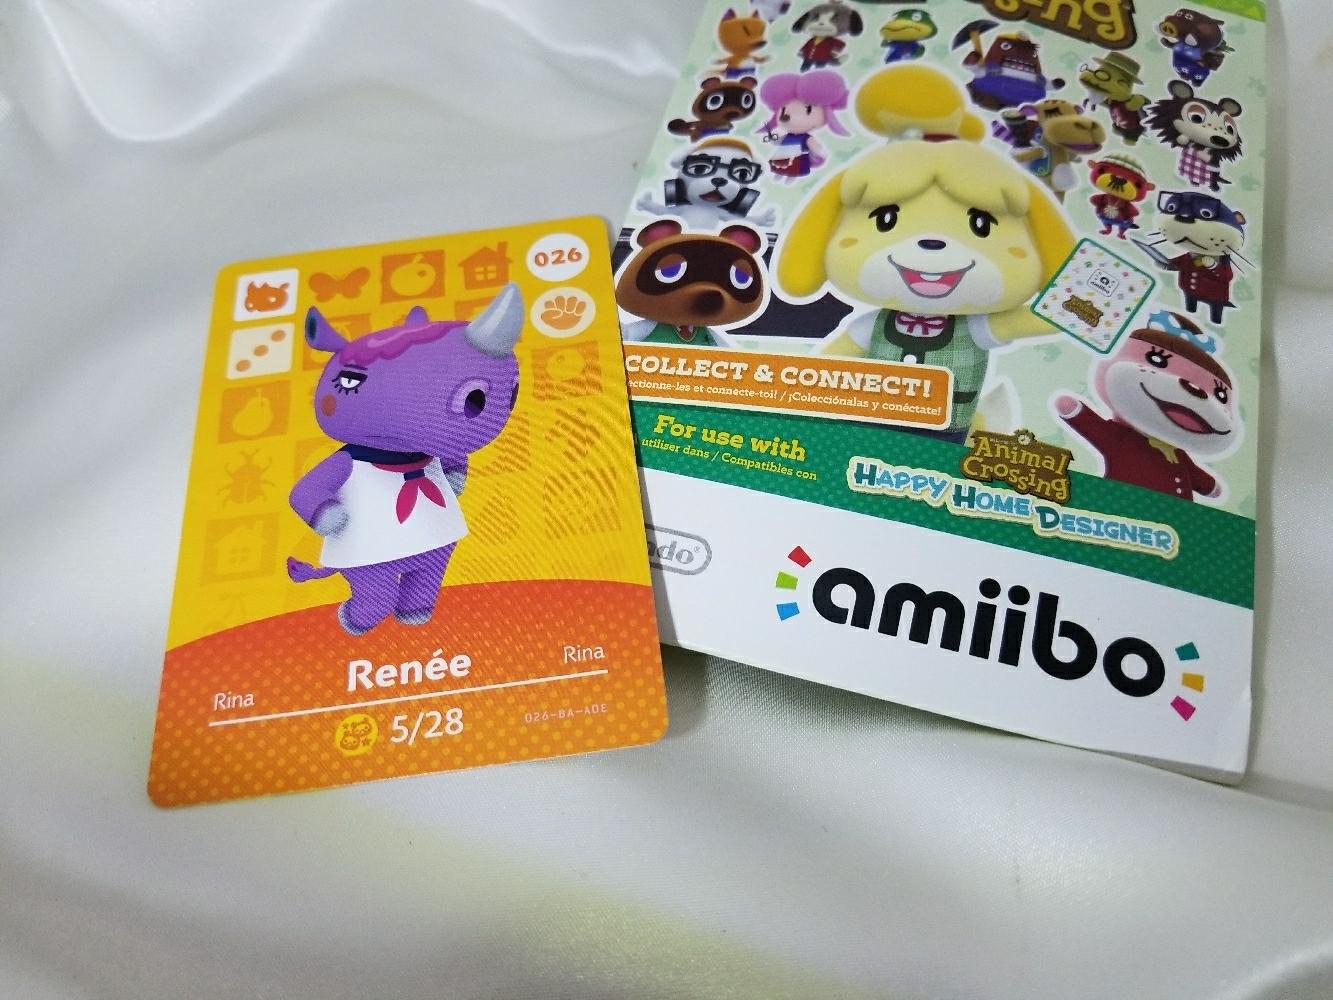 026 - Renee - Series 1 Animal Crossing Villager Amiibo Card